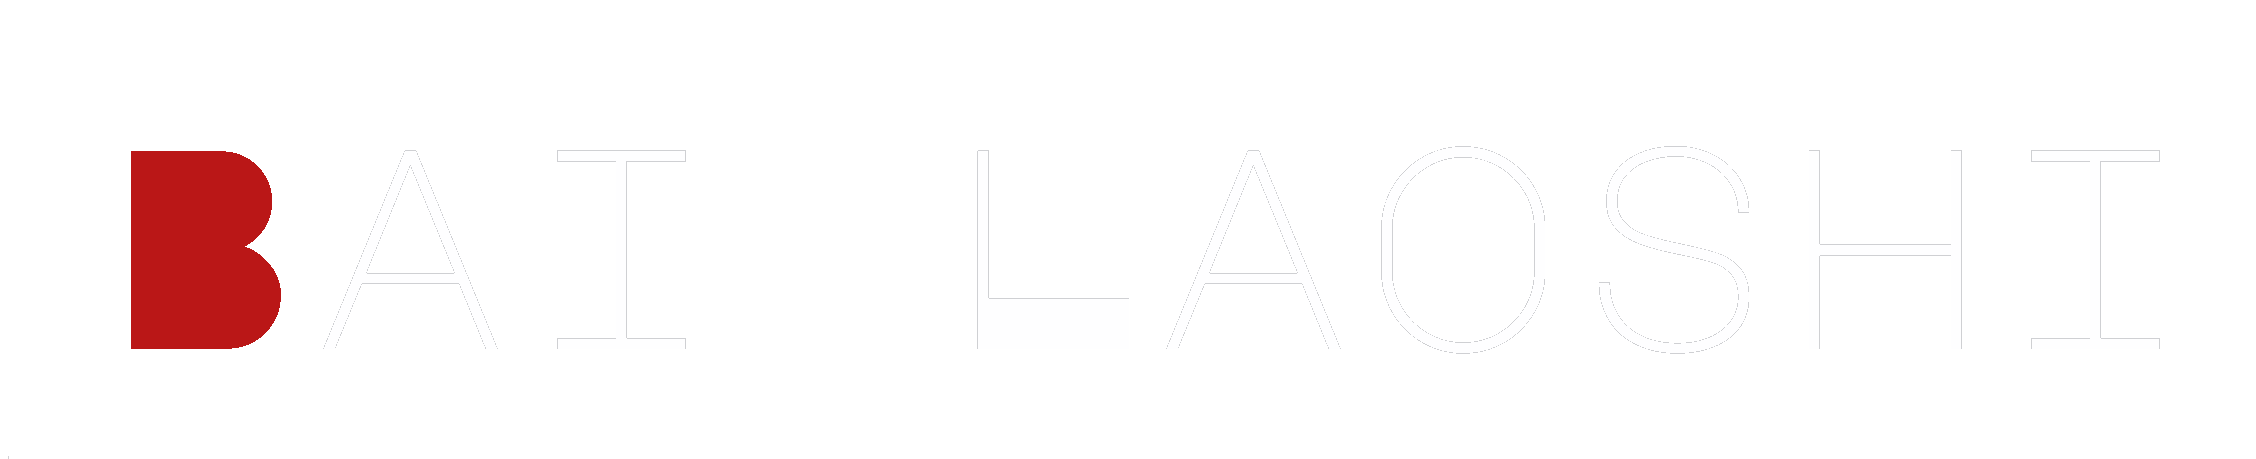 logobailaoshi horizontal